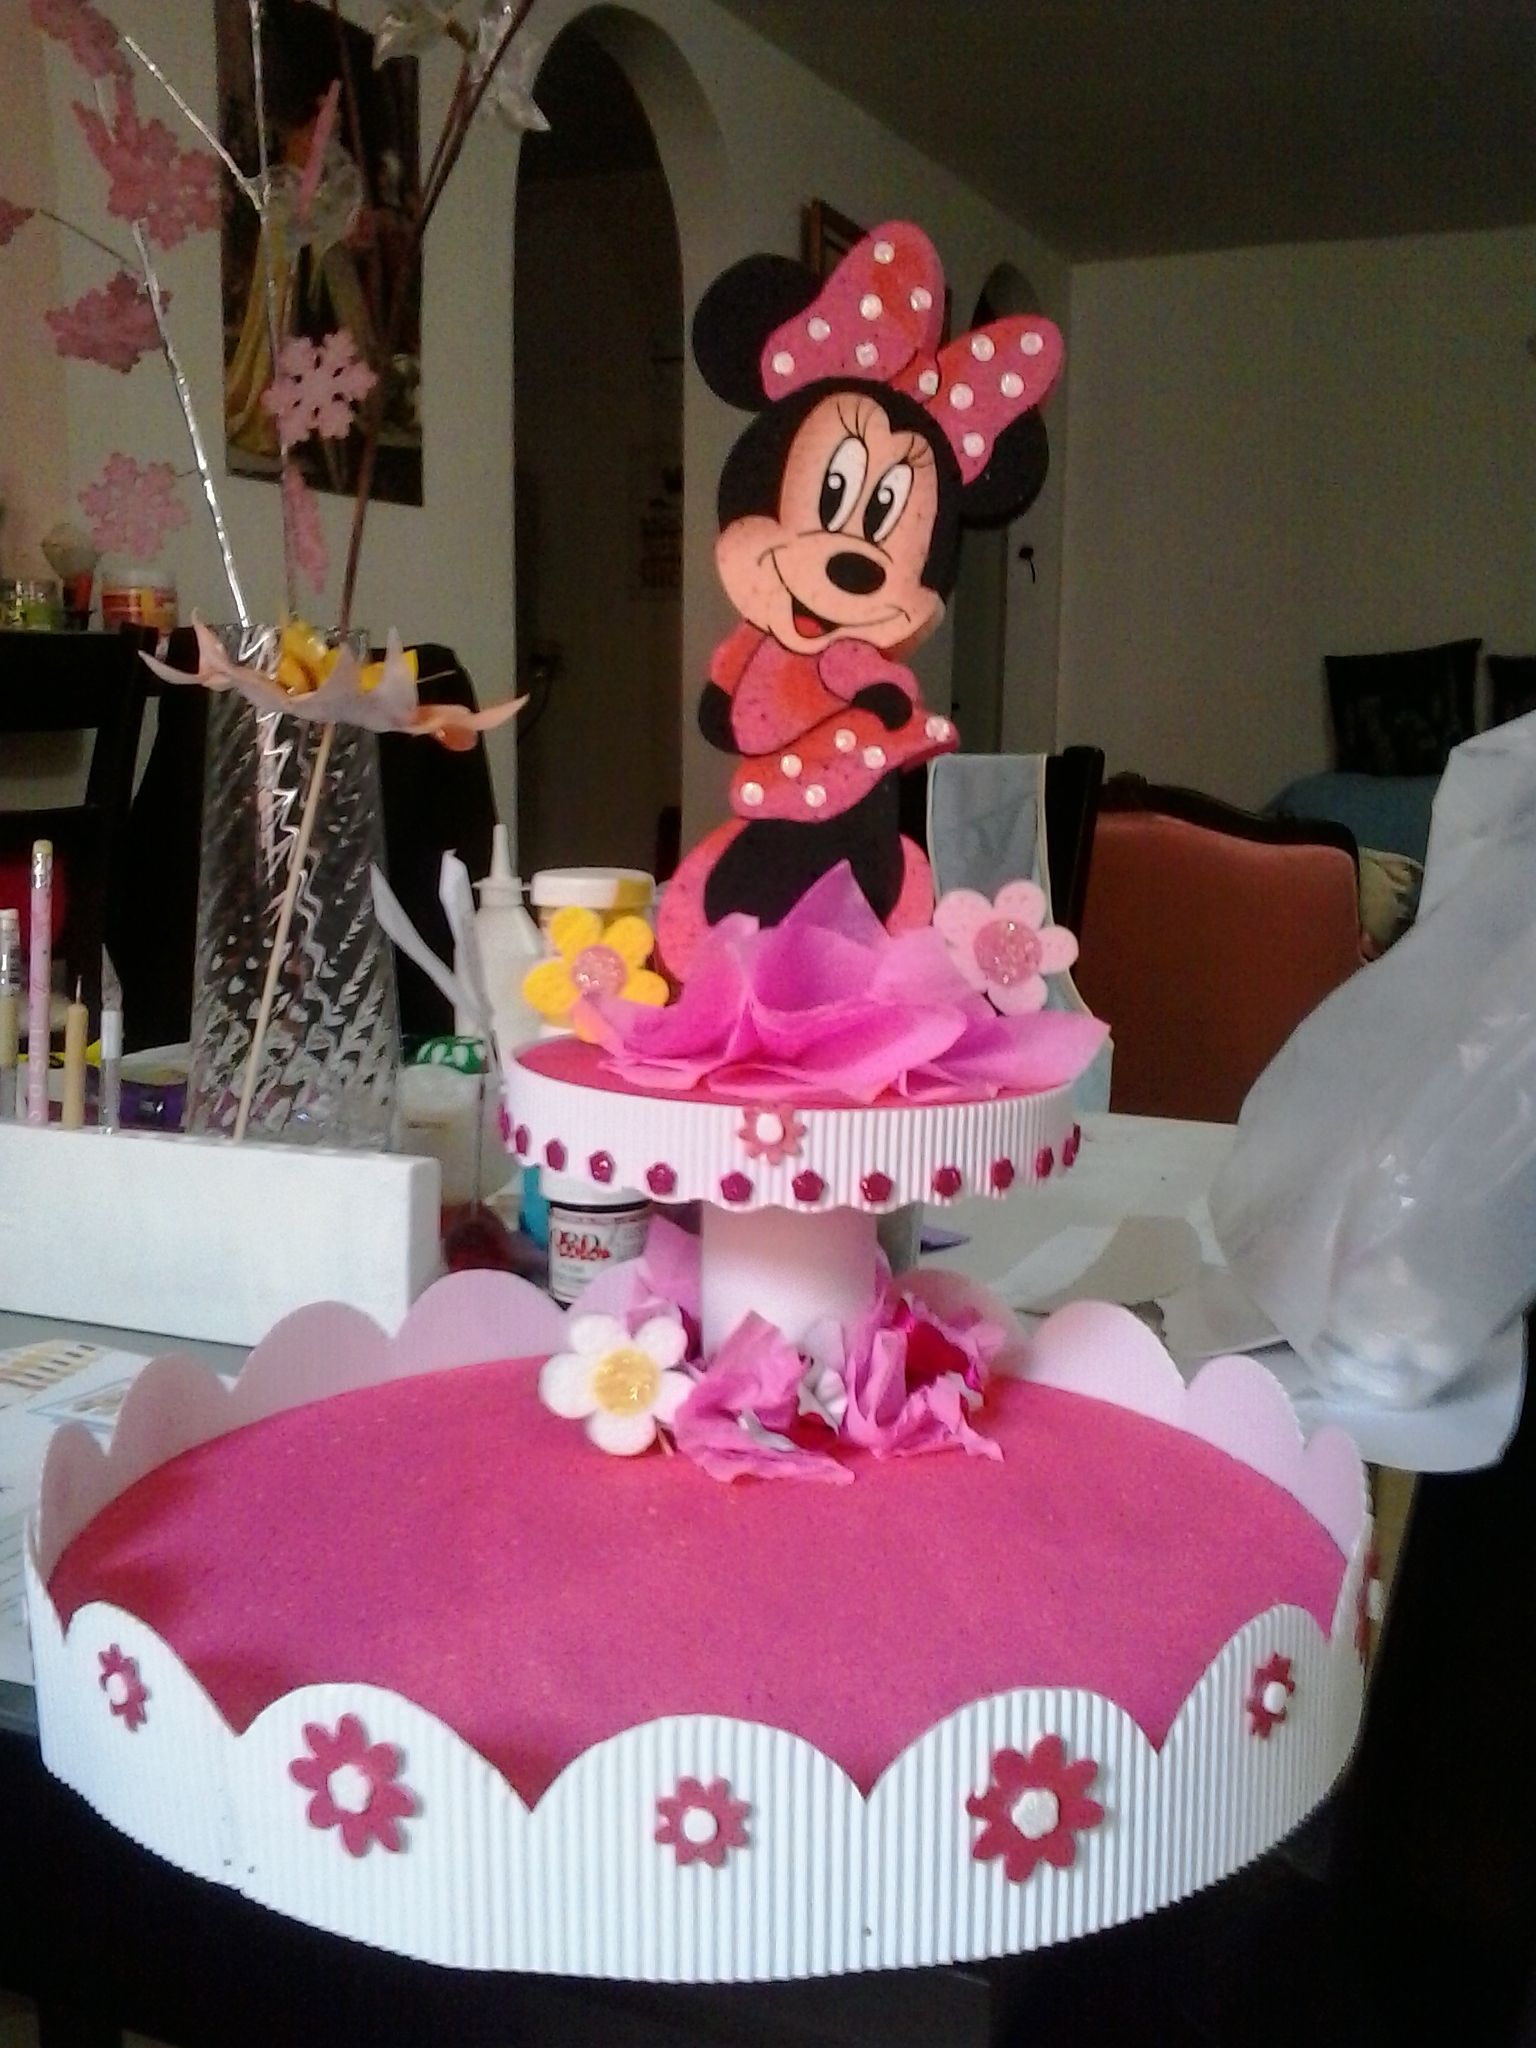 Chupetero Minnie Mouse | CeNtRoS dE mEsA p/ NiÑ@s | Pinterest ...